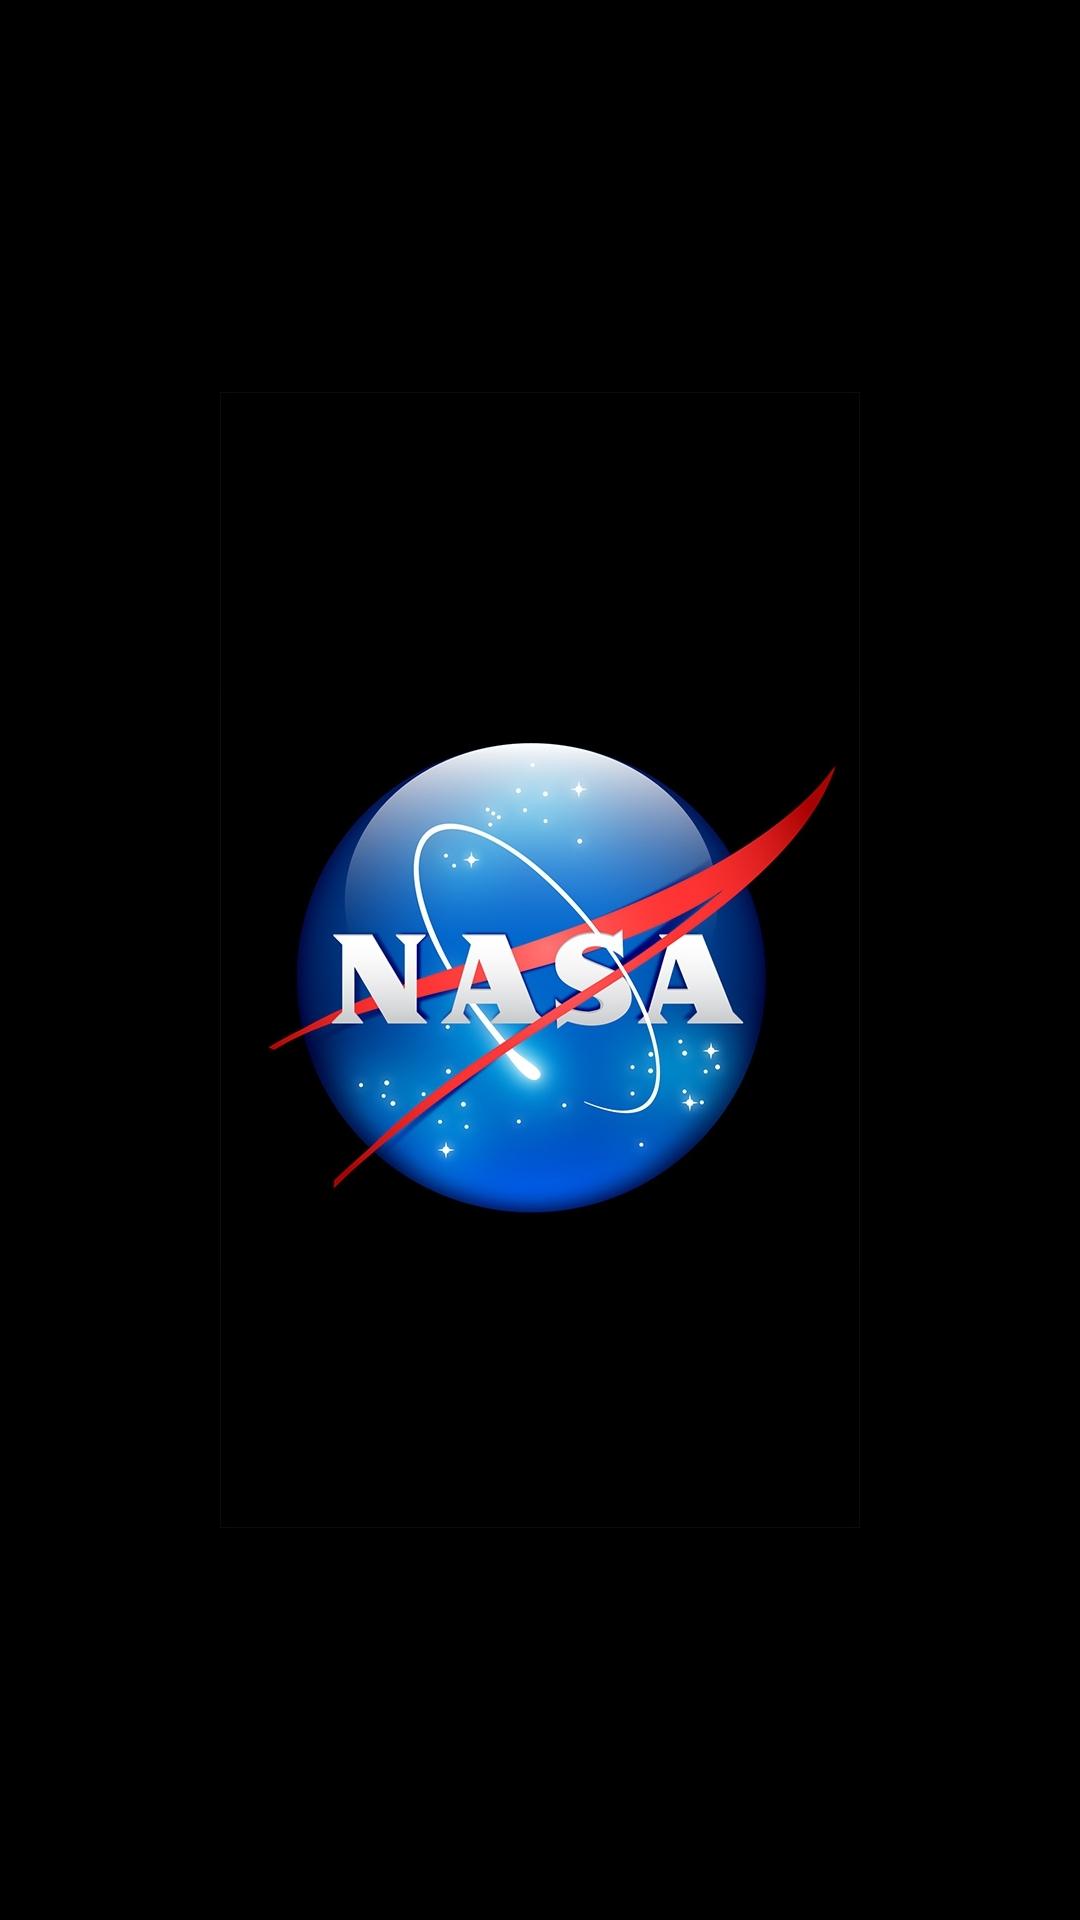 [72+] Nasa Logo Wallpaper On WallpaperSafari